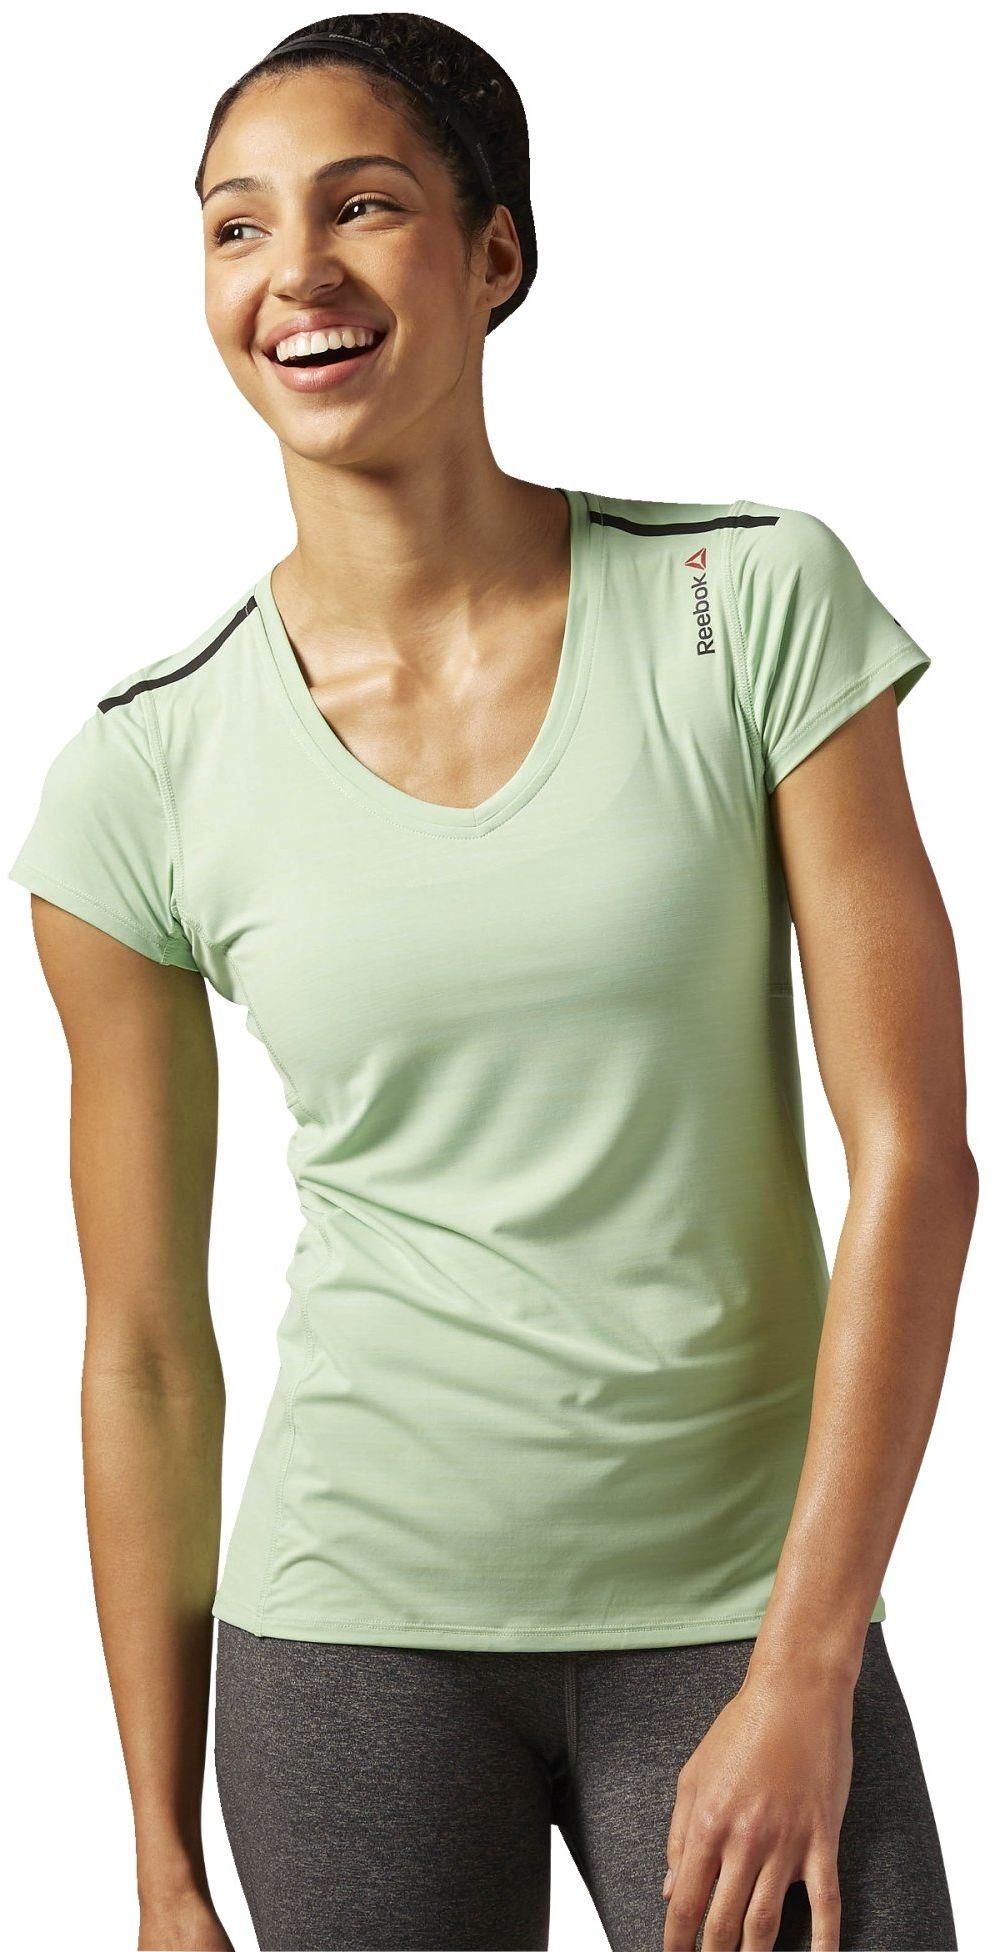 Reebok ONE Series ACTIV Chill T-Shirt, Seafoam Green, L